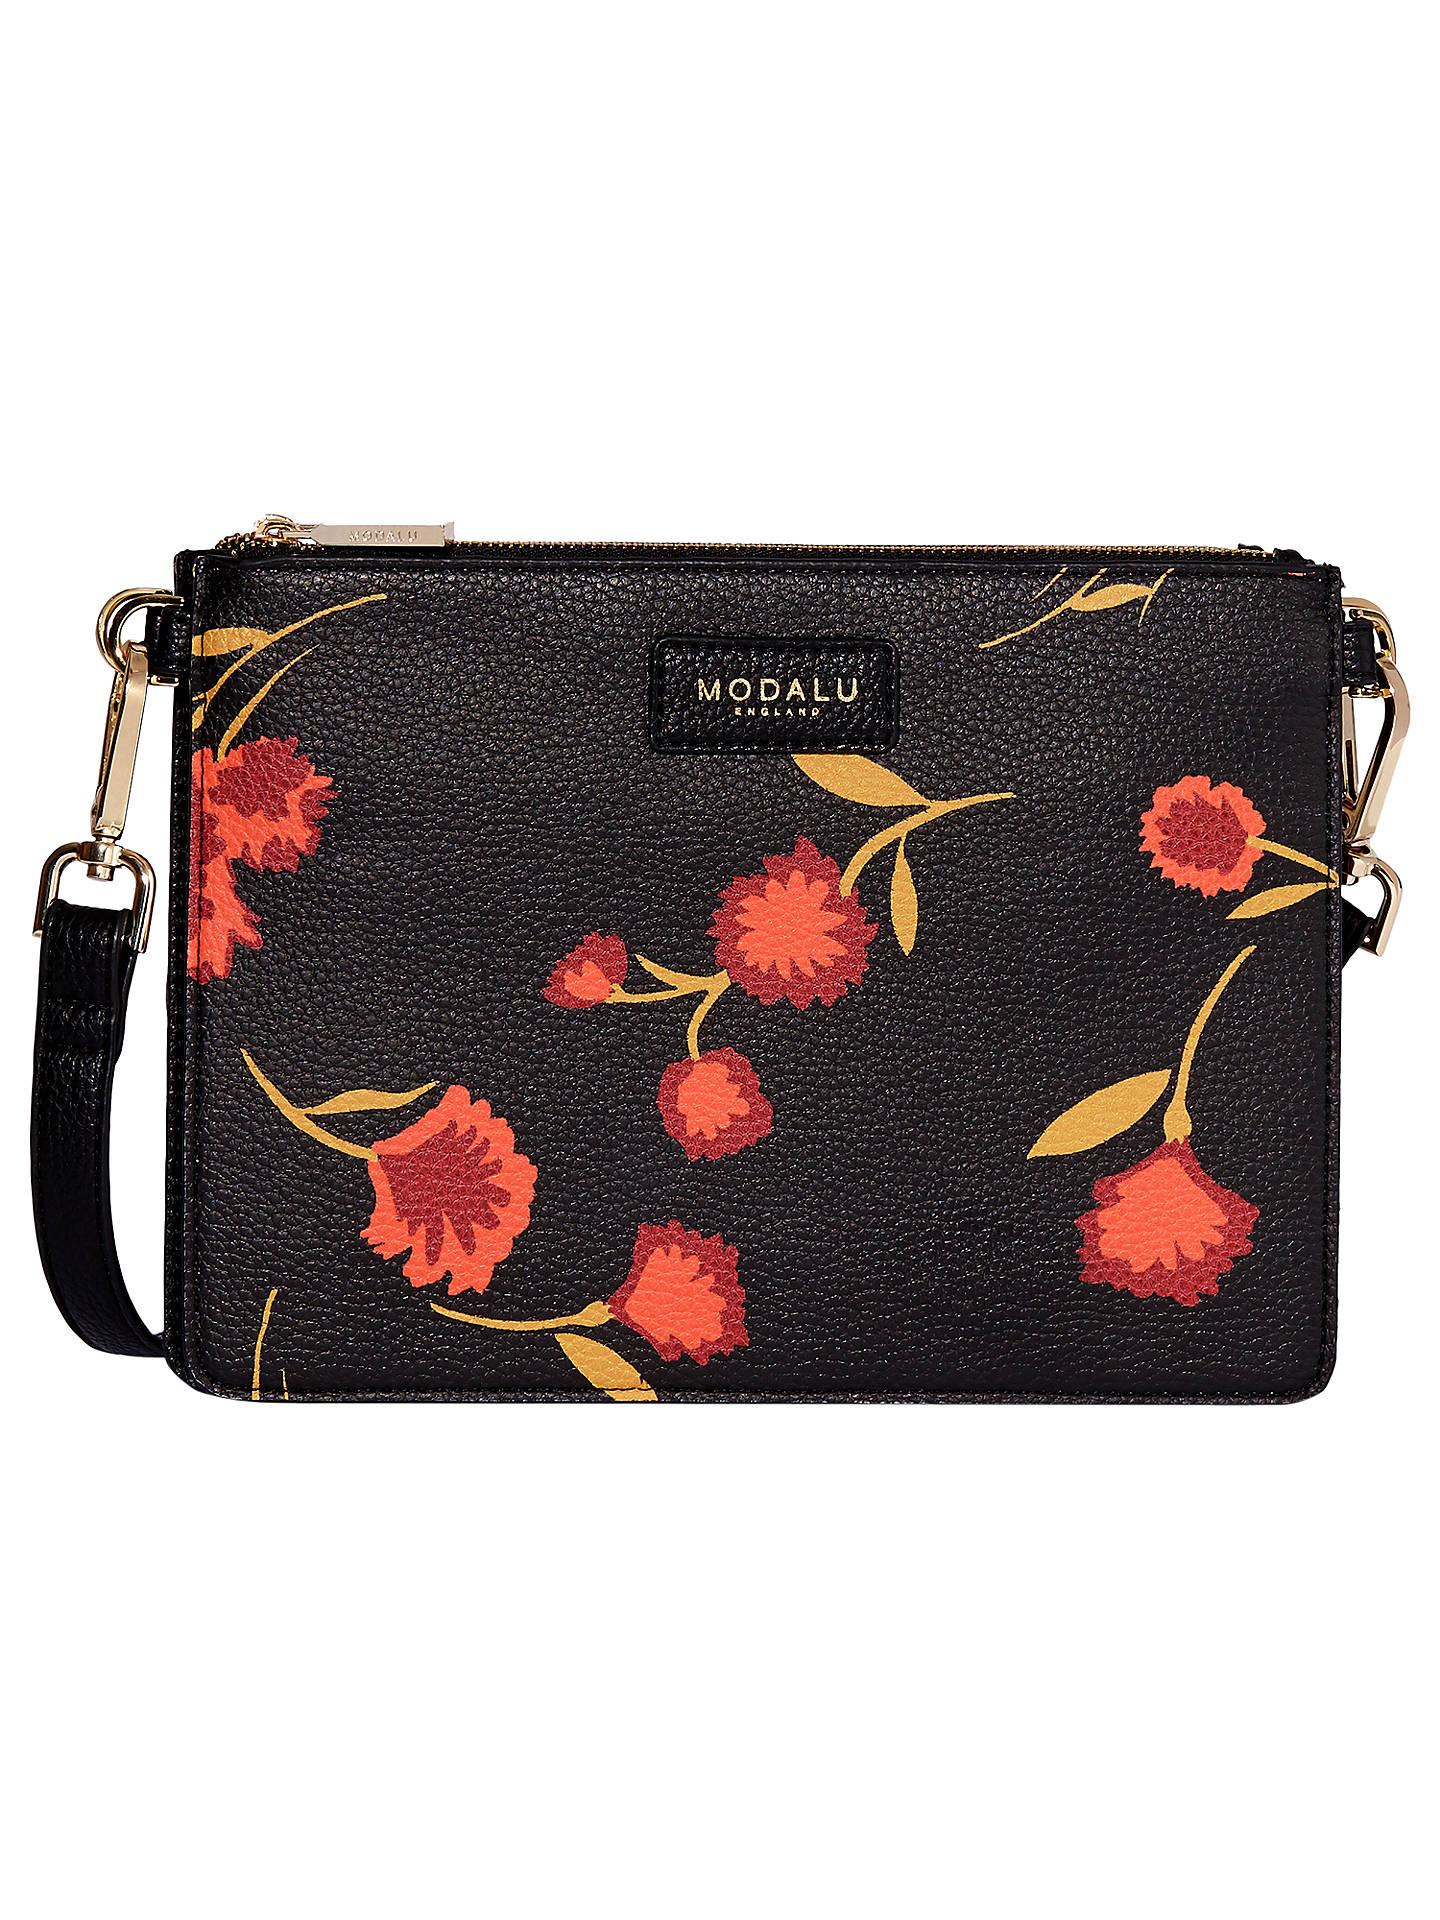 39d30668f300 BuyModalu Jessica Cross Body Bag